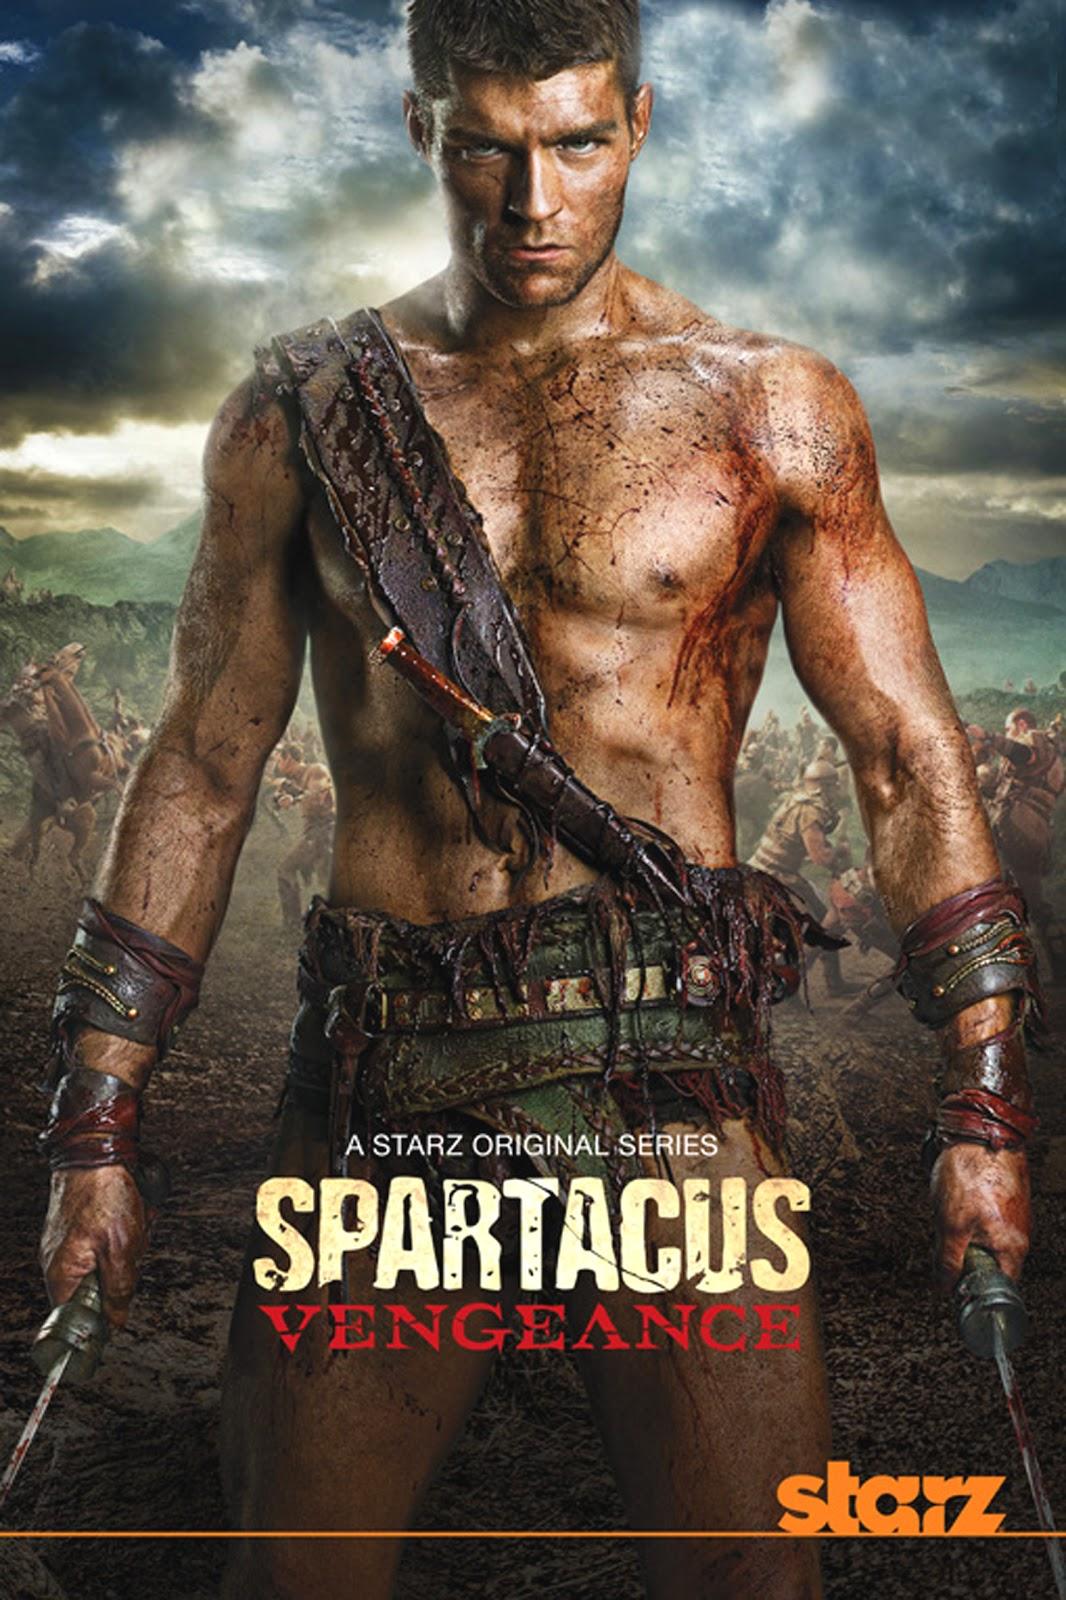 Spartacus Vengeance 2012 Filme Online Online Subtitrat Filme Online Gratis Subtitrate